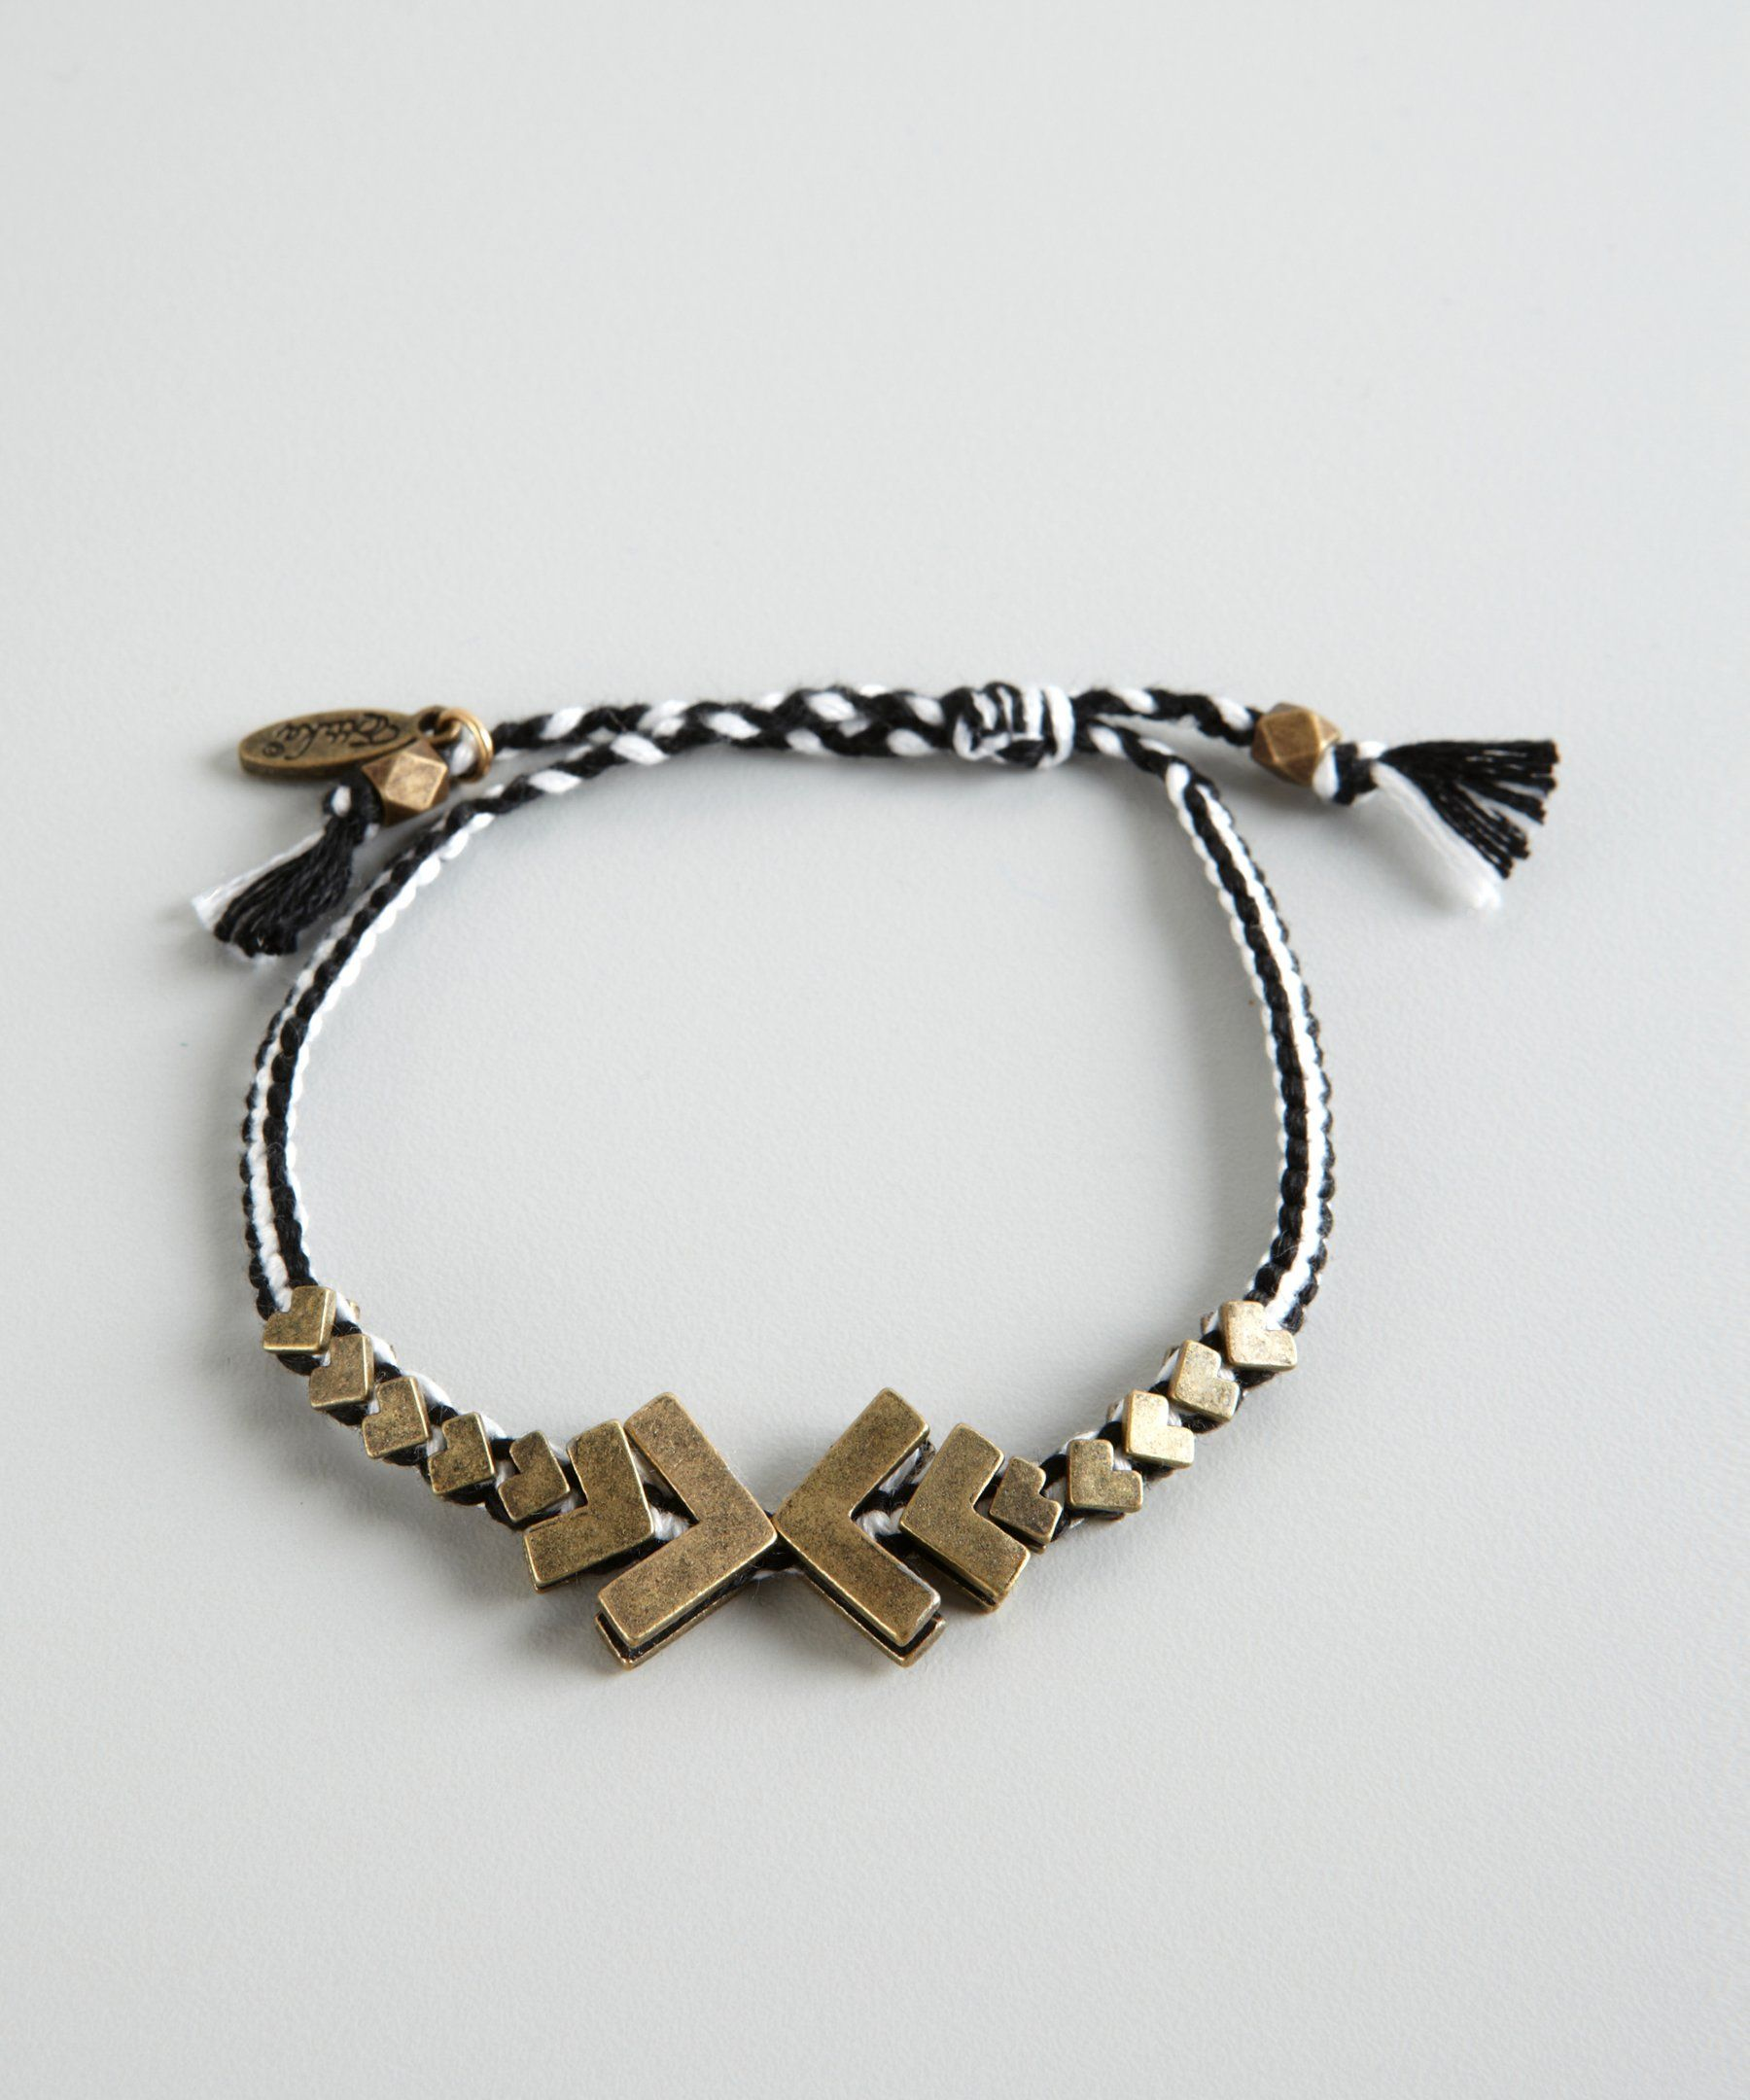 Ettika black and white cotton braided chevron metal trim friendship bracelet | BLUEFLY up to 70% off designer brands